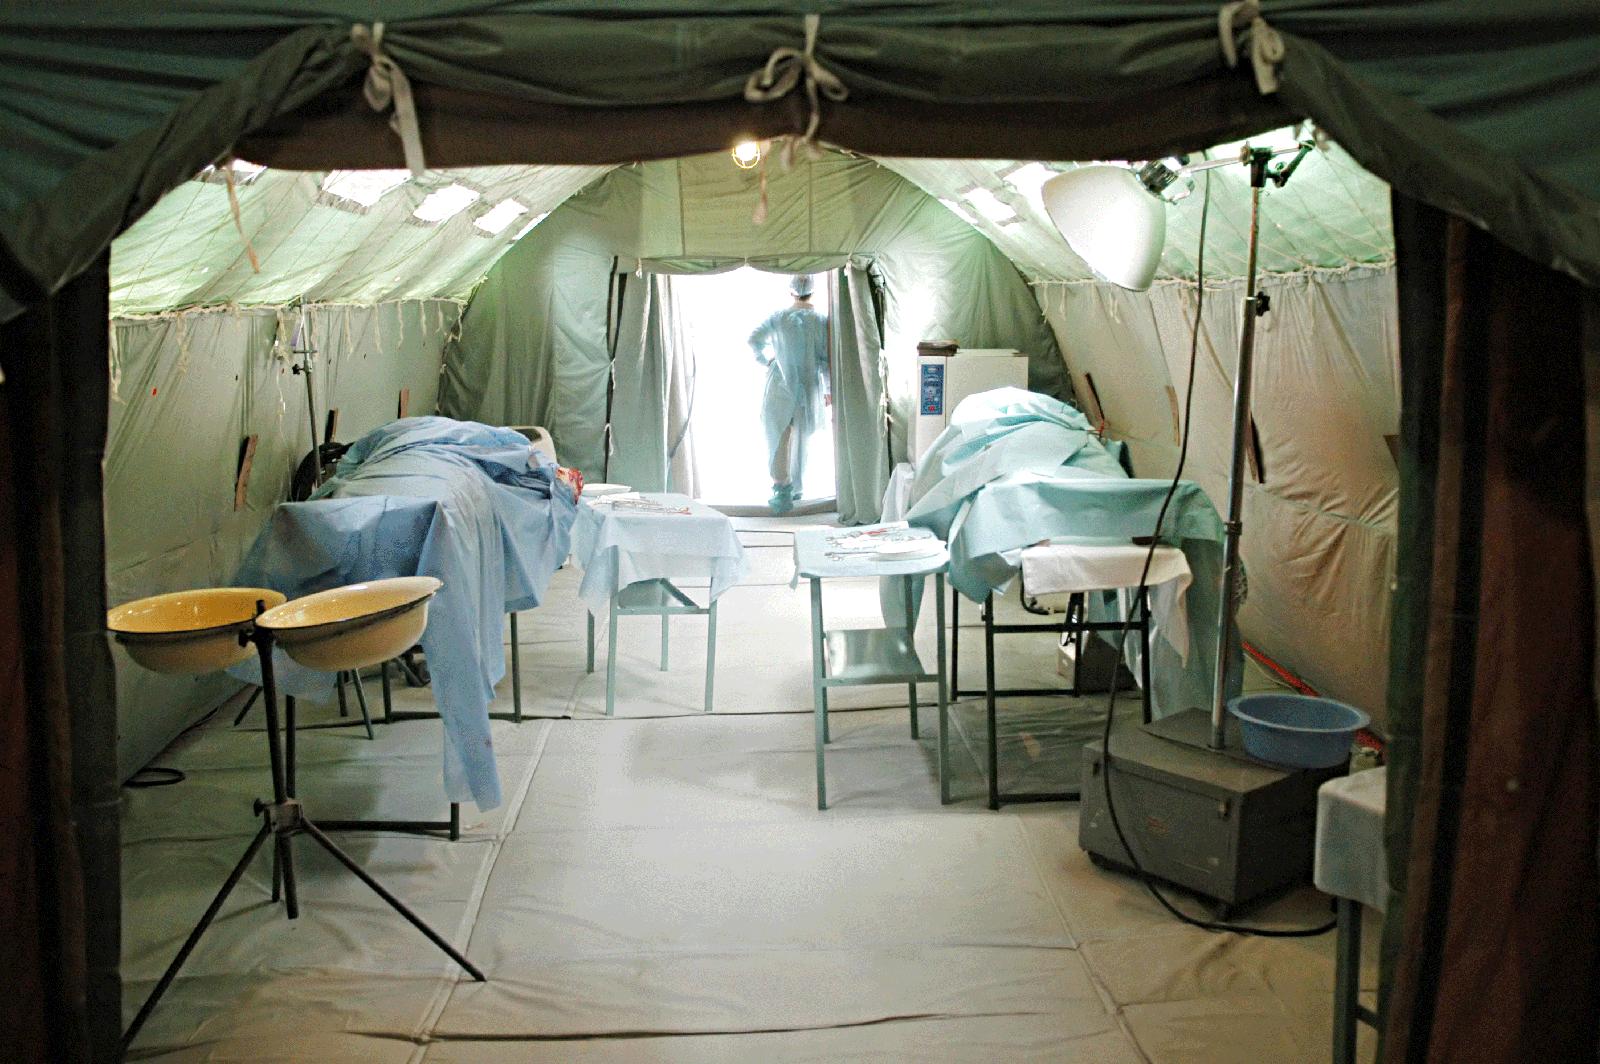 COL Stephen Hetz - Society of Military Surgeons